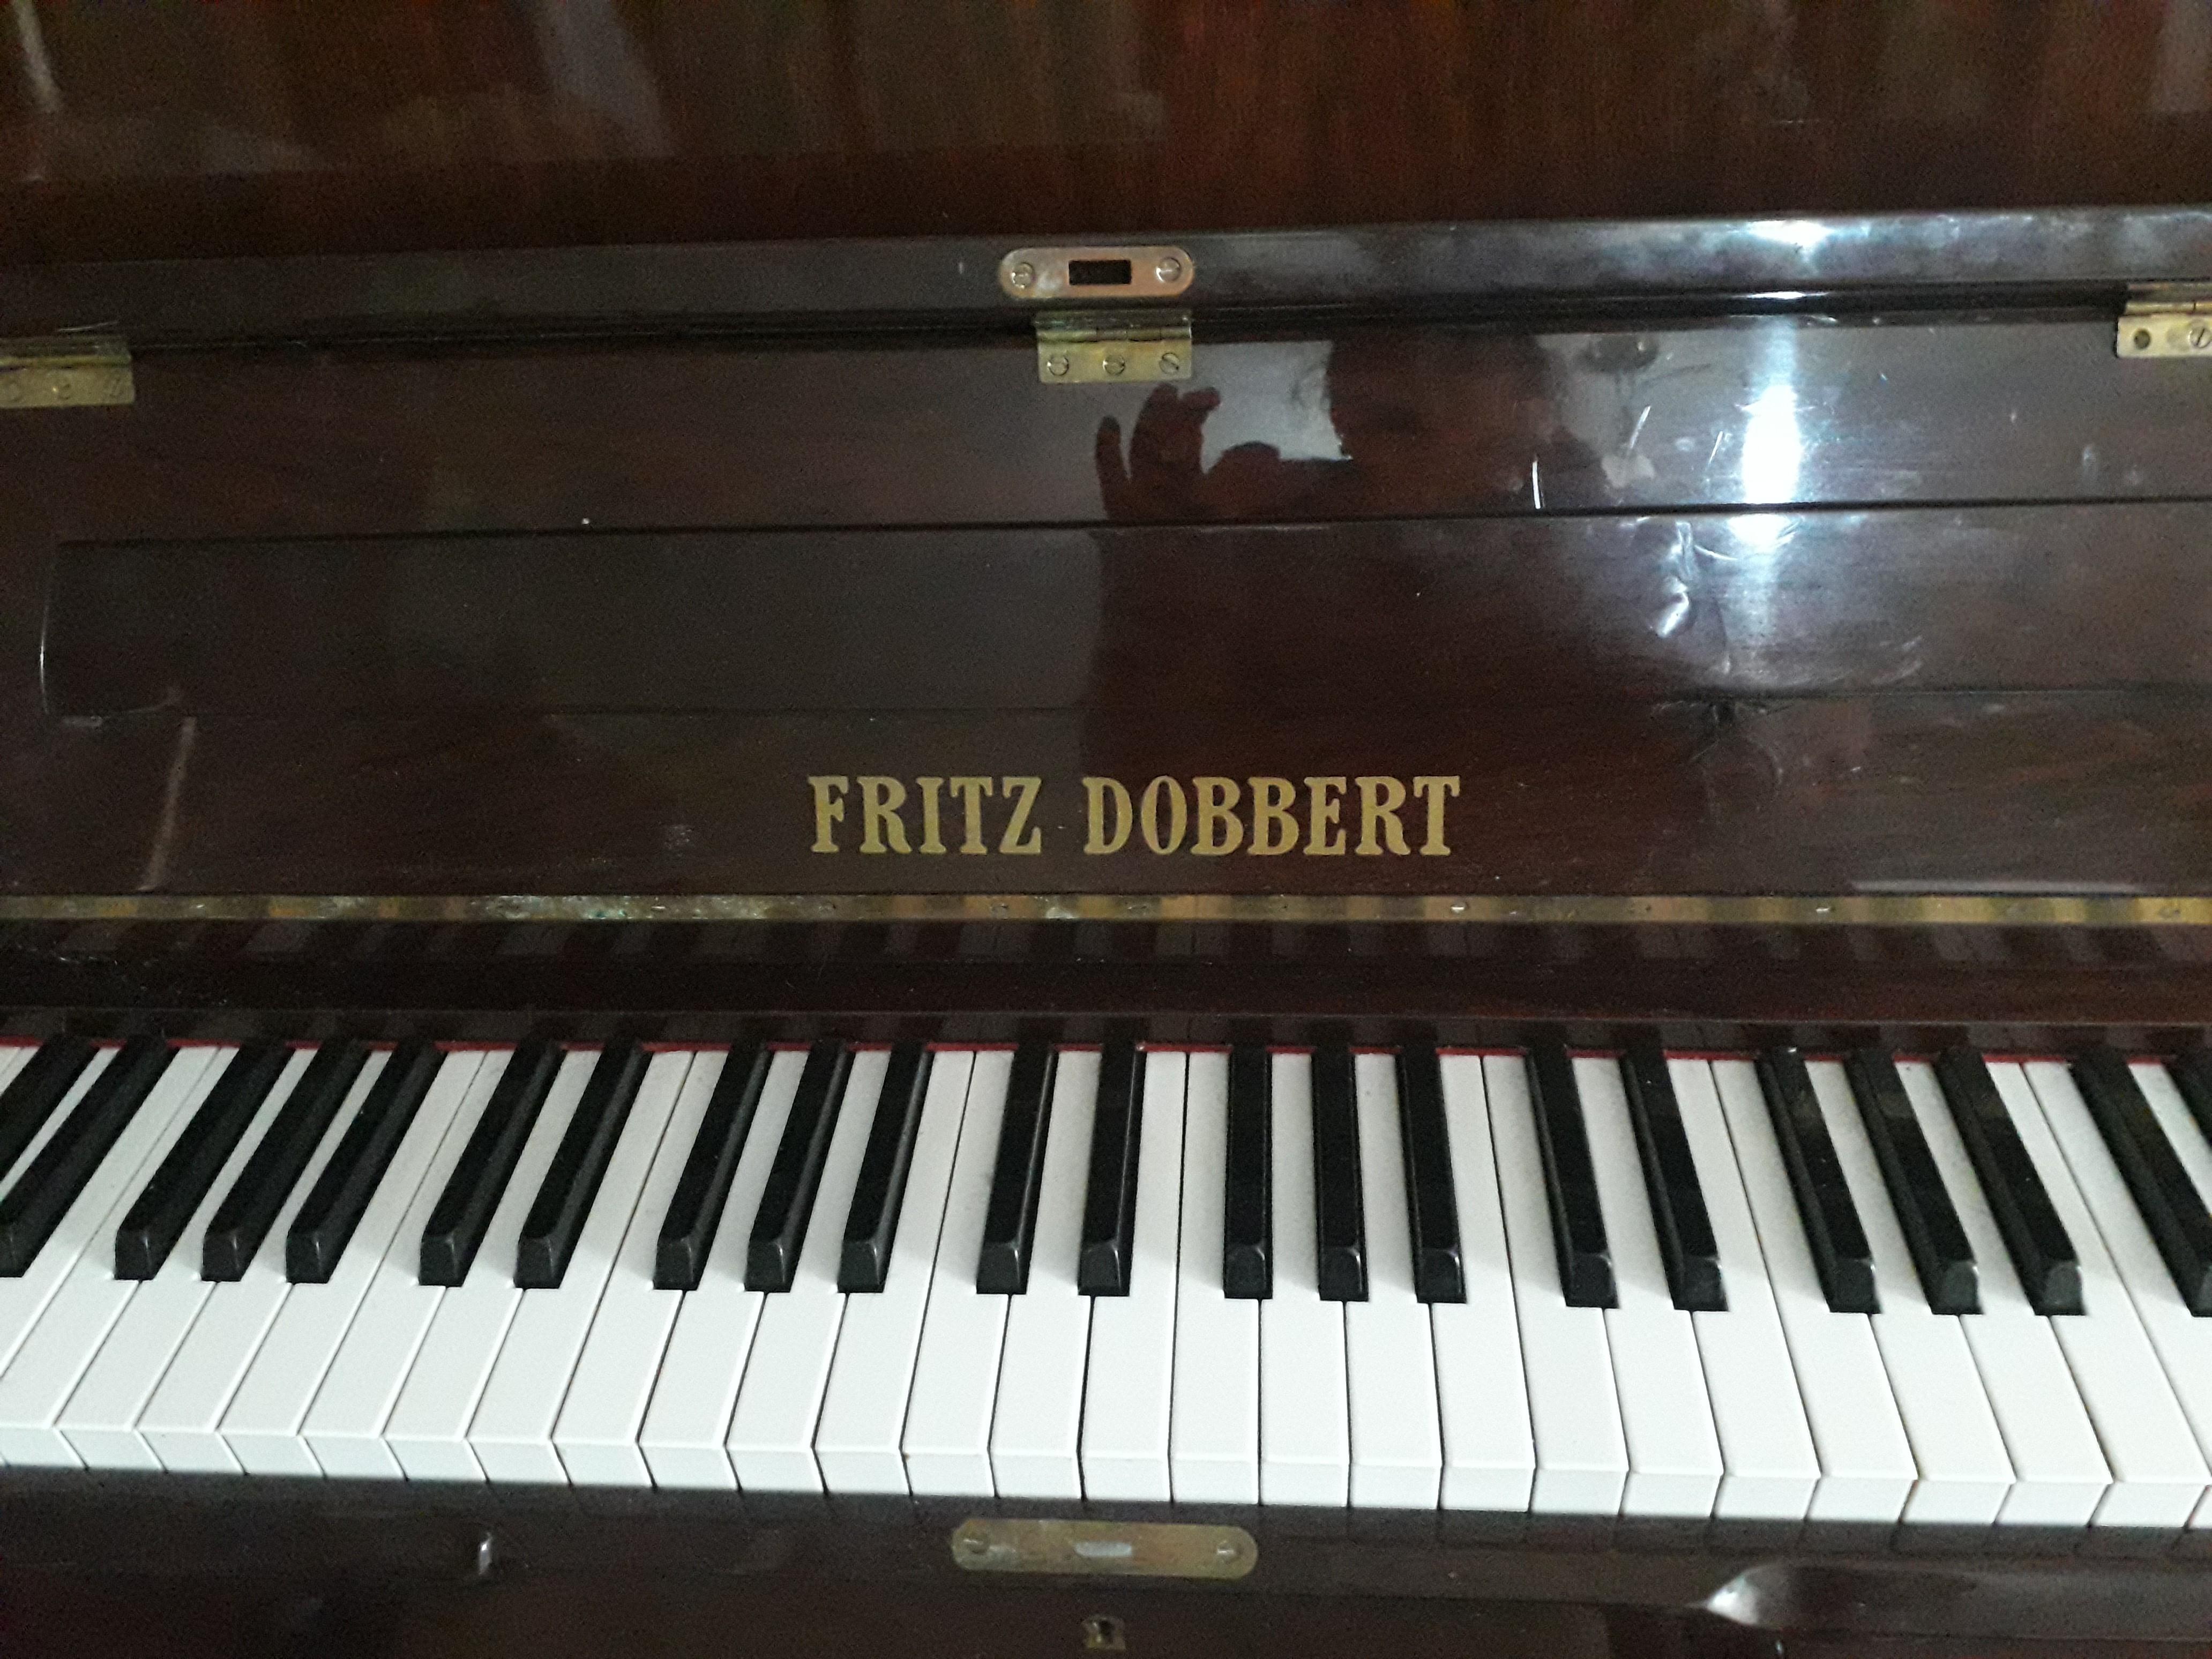 Piano FRITZ DOBBERT VERTICAL 114 imbuia